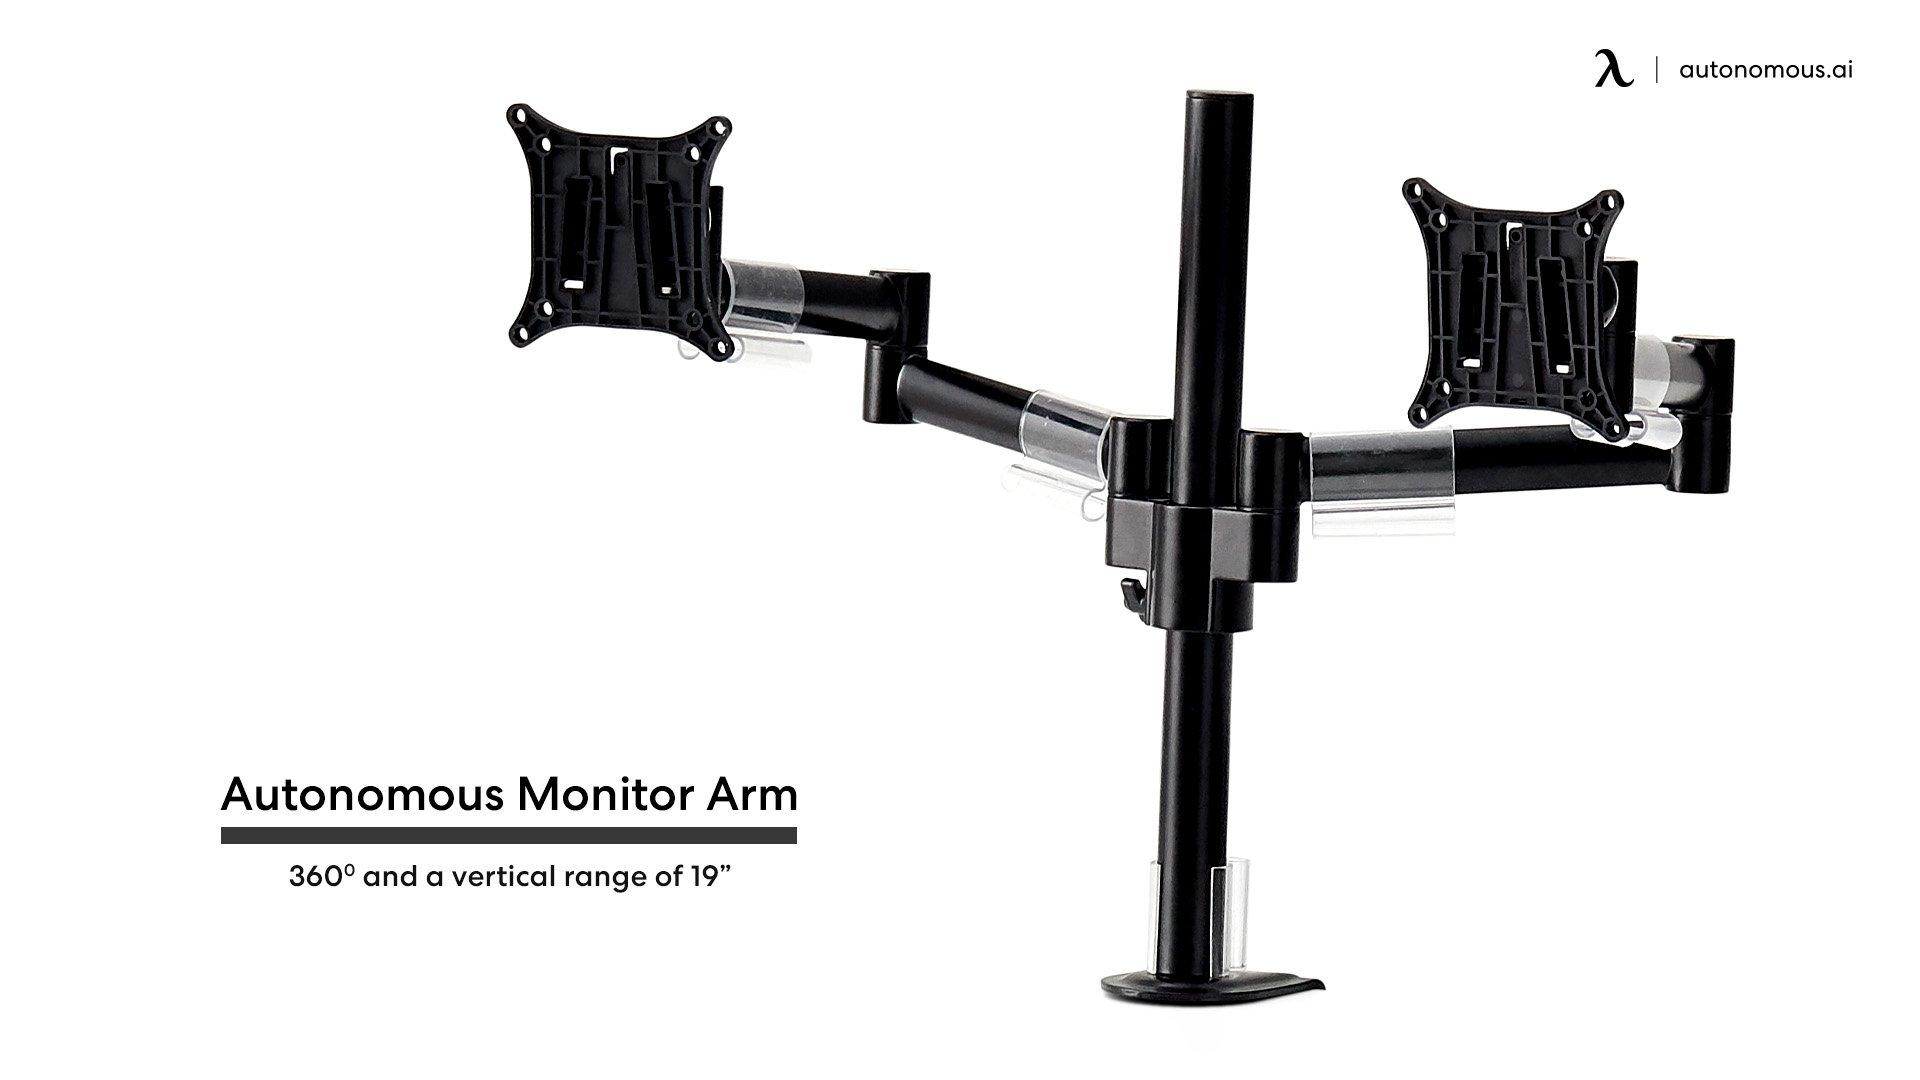 Autonomous adjustable monitor arm